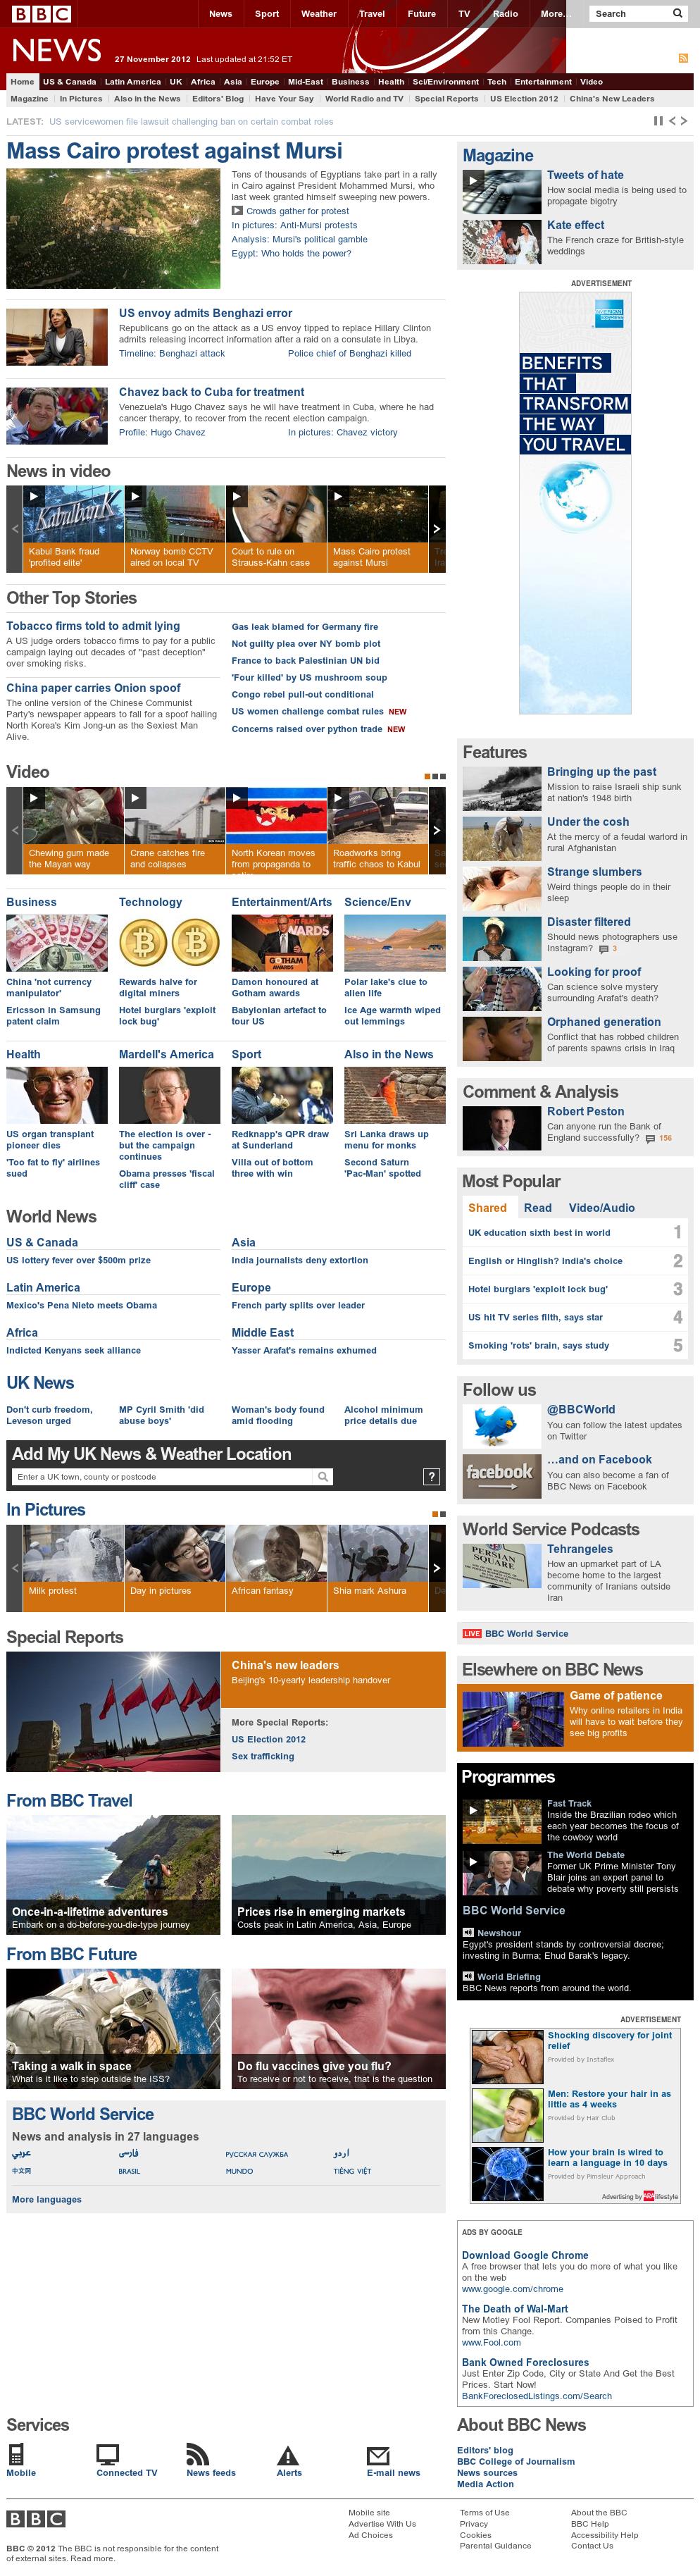 BBC at Wednesday Nov. 28, 2012, 3:02 a.m. UTC